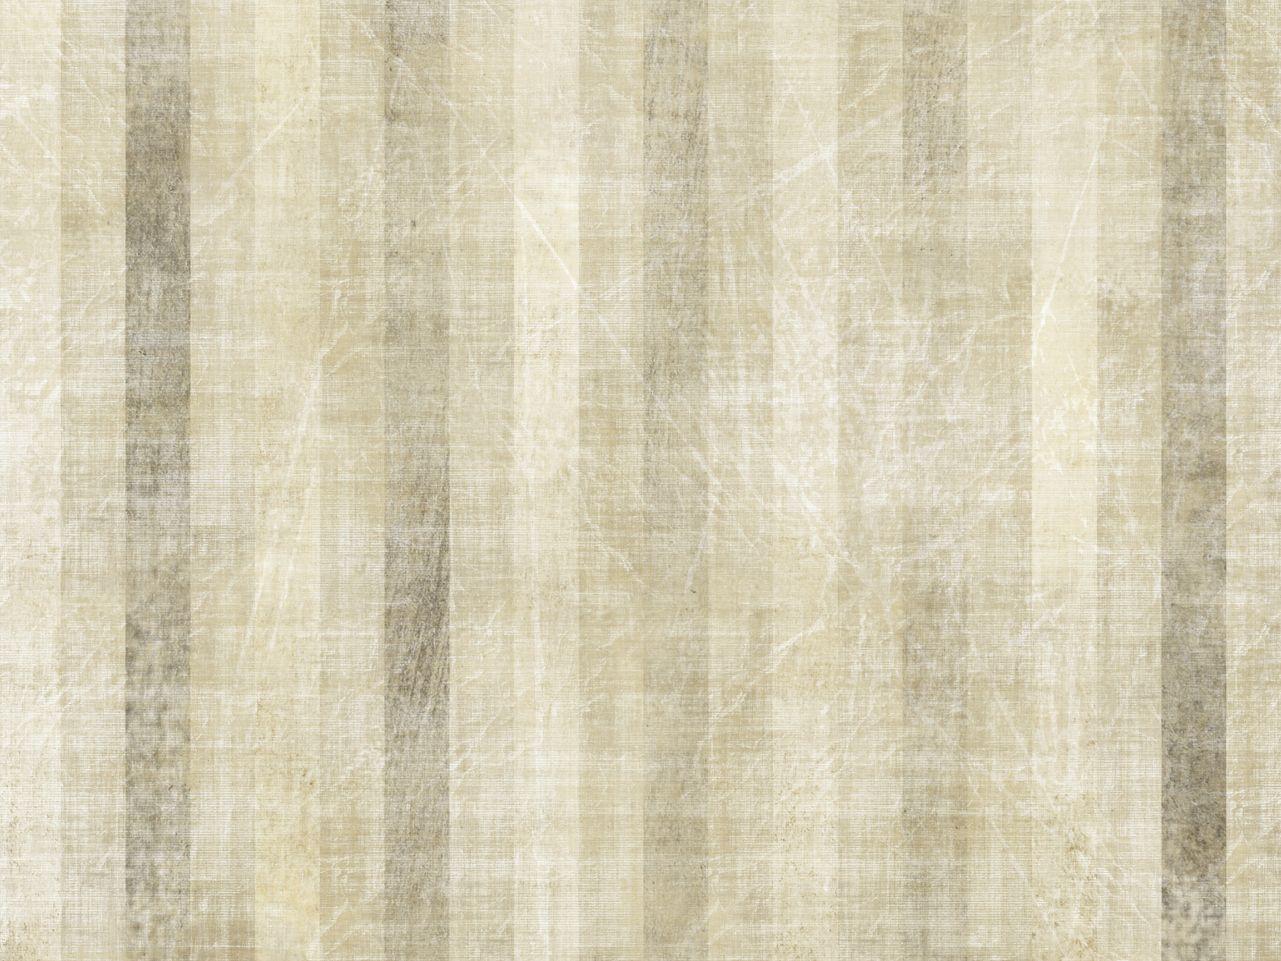 Carta da parati a righe striping by wall dec design for Carta parati